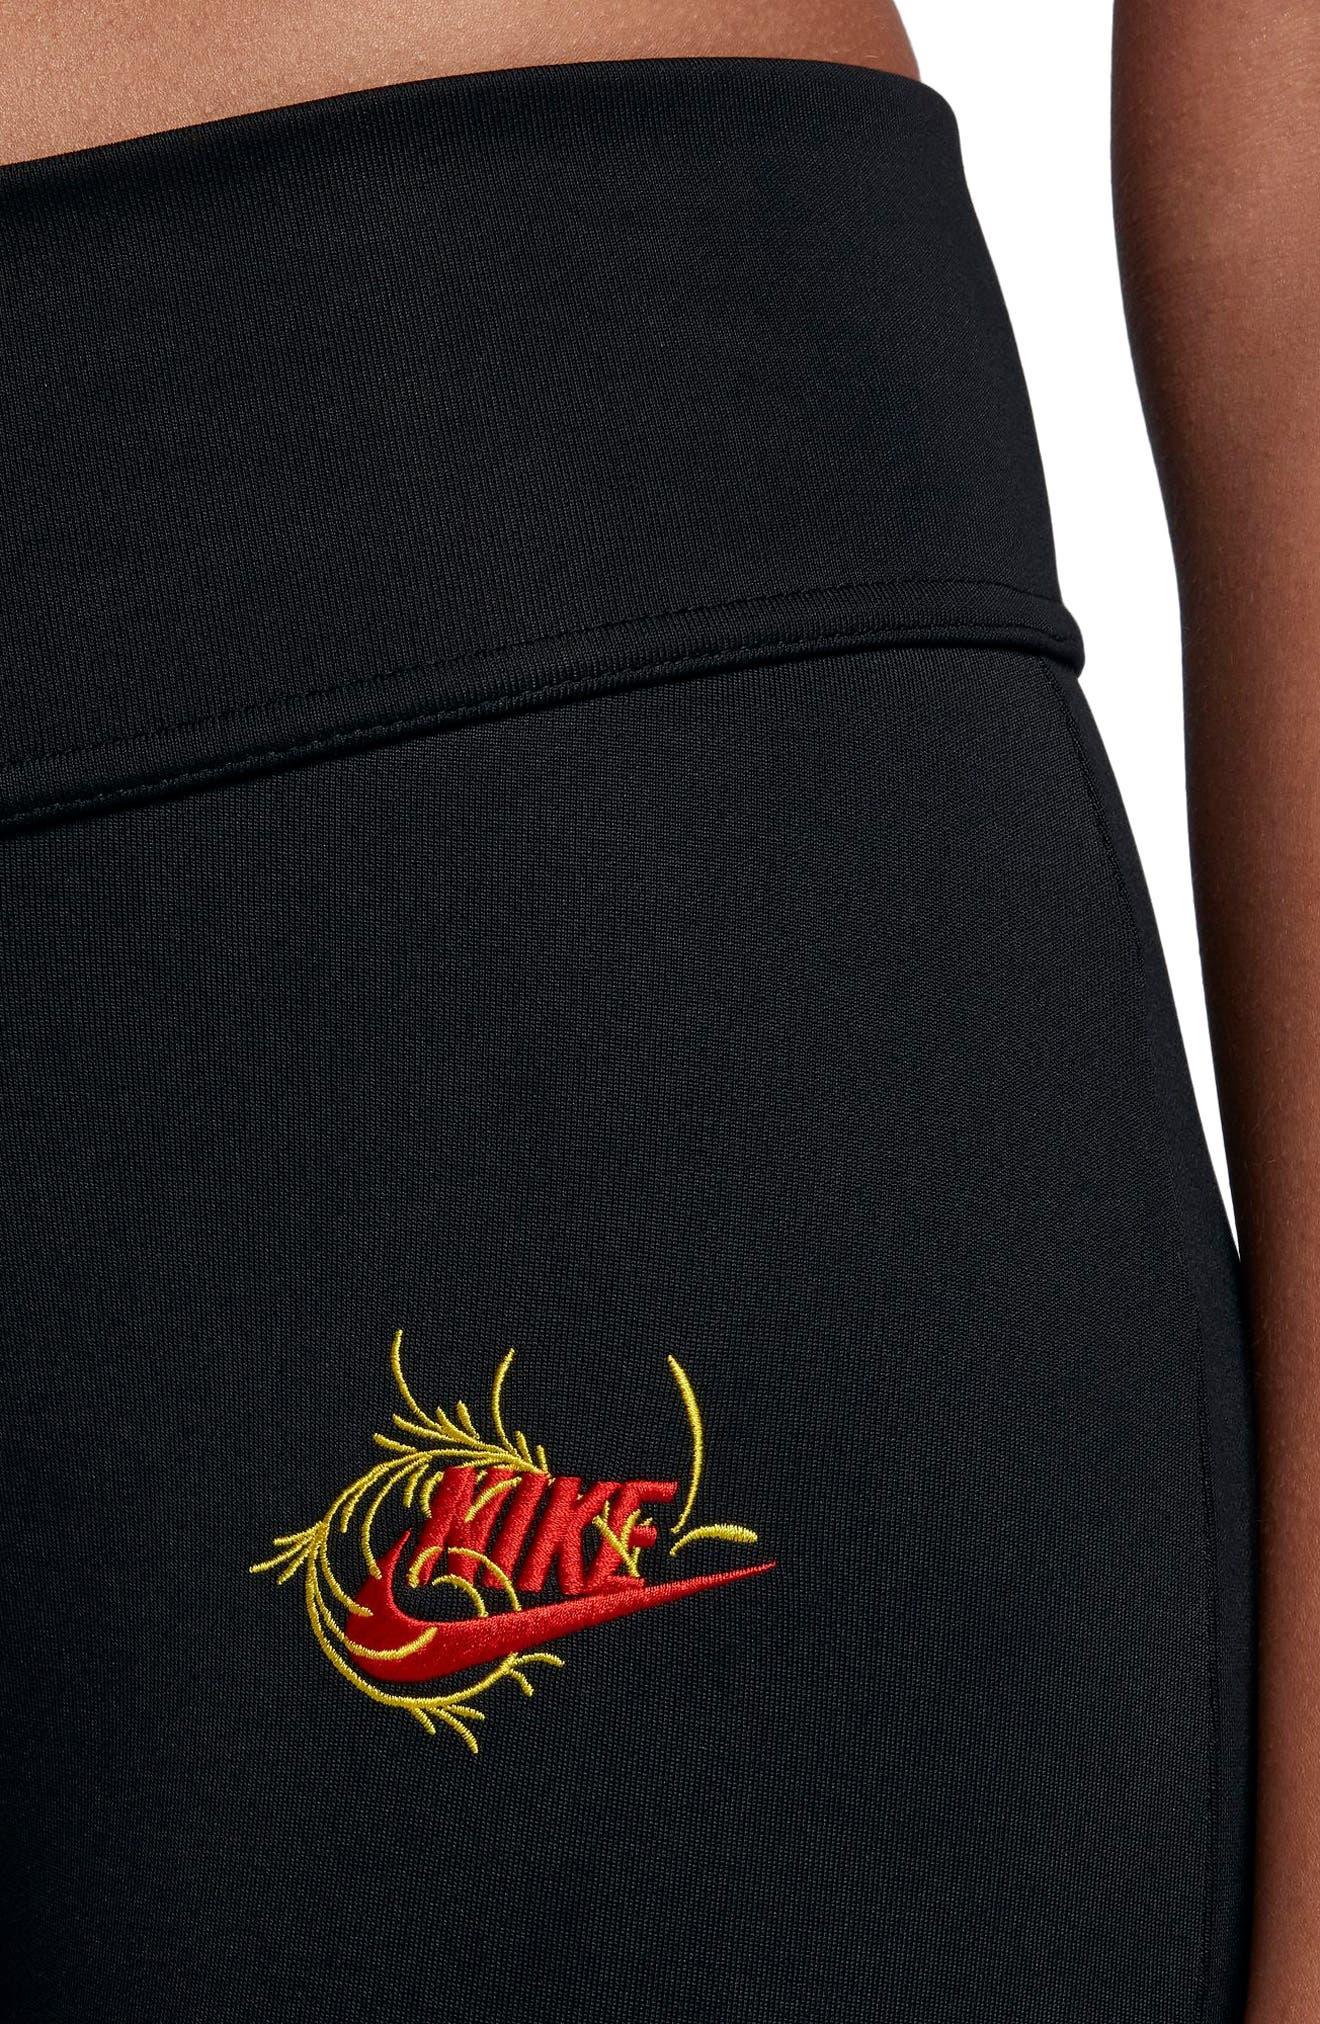 Sportswear Essential Floral Leggings,                             Alternate thumbnail 5, color,                             Black/ University Red